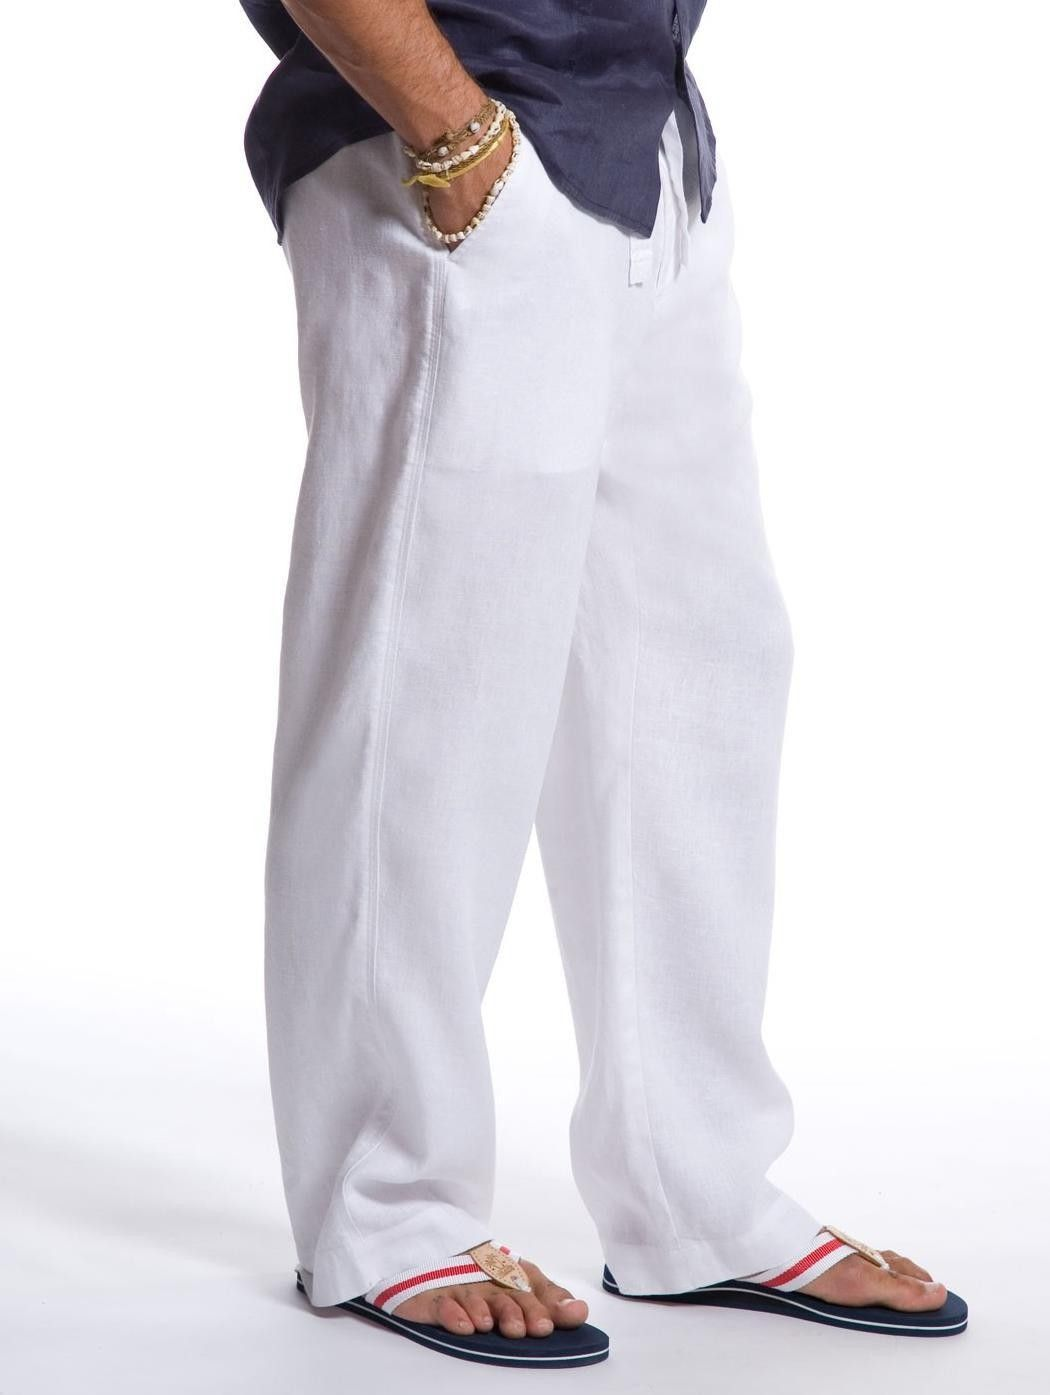 315a429cfe Beachcomber Linen Pants - White Linen Pants for Men | Island Company ...